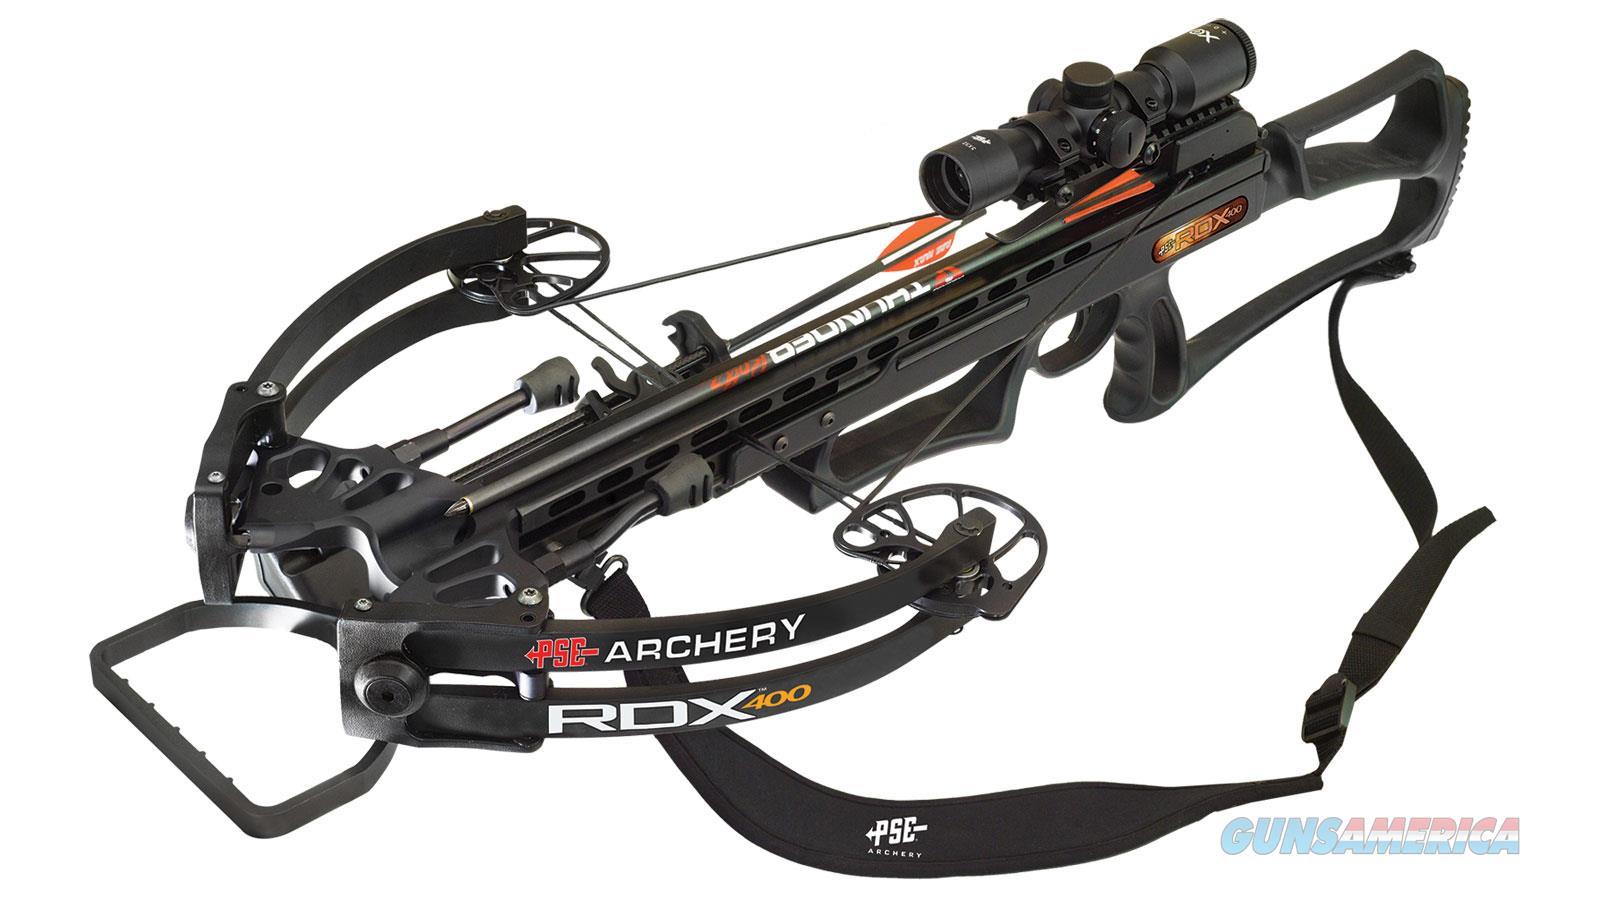 Pse Archery Rdx 400 Bk 01275BK  Non-Guns > Archery > Bows > Crossbows